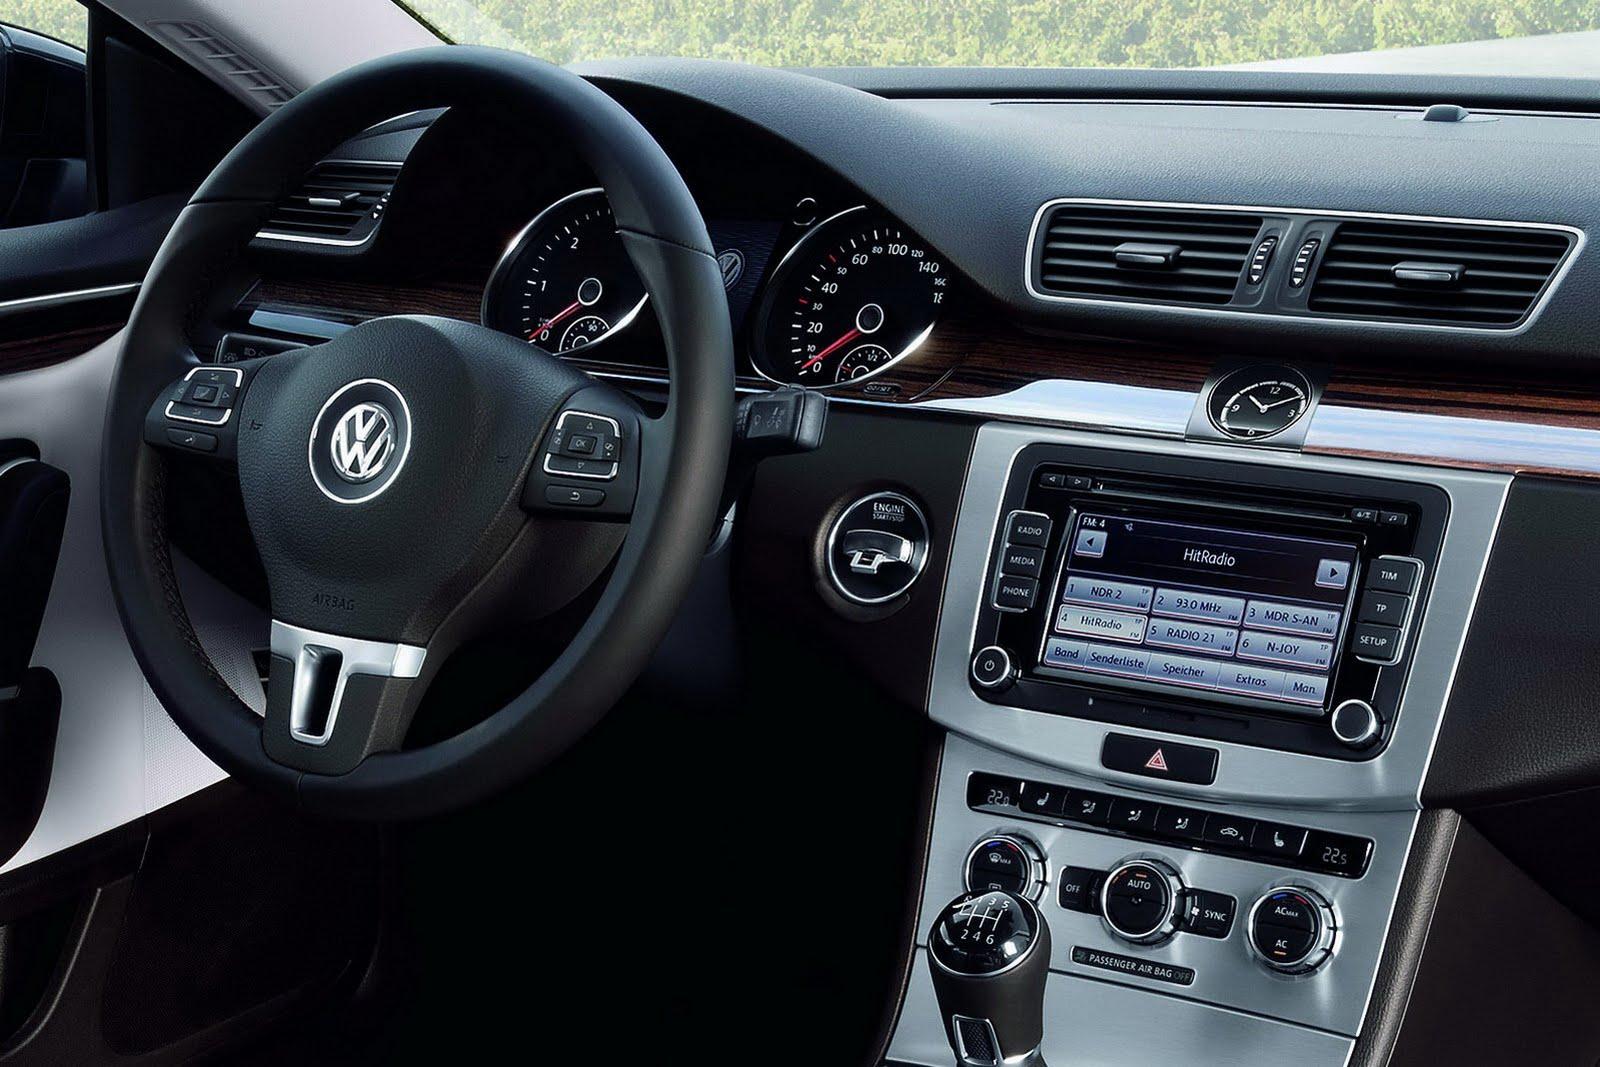 2013 volkswagen passat cc facelift unveiled autoevolution. Black Bedroom Furniture Sets. Home Design Ideas